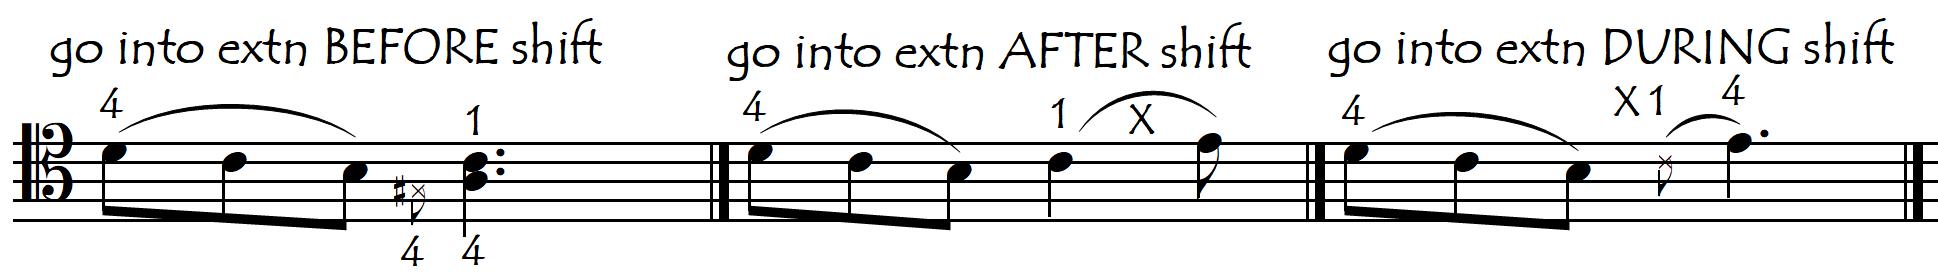 shift non to extd 3 ways new